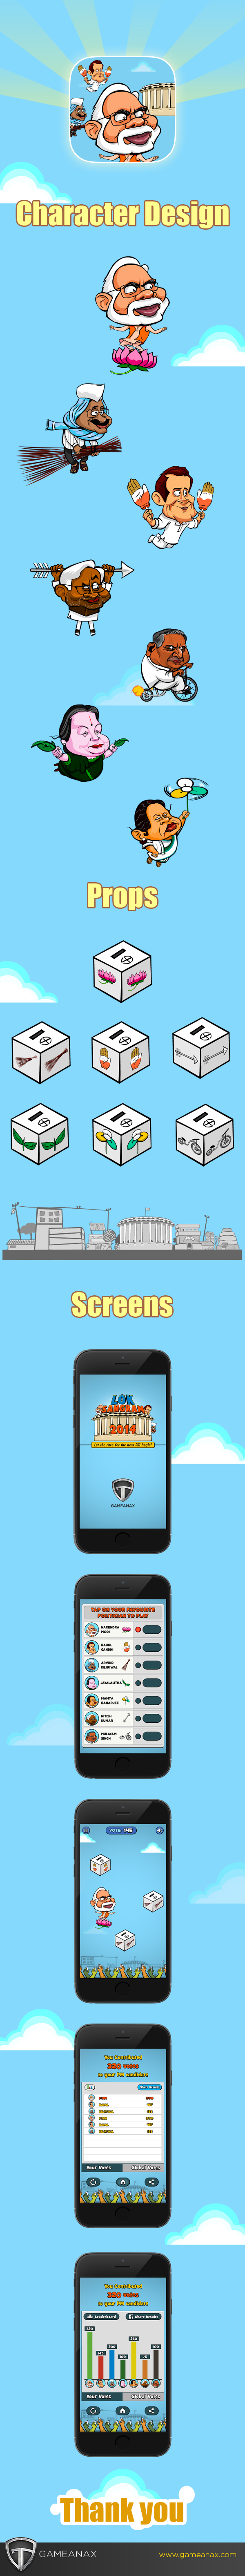 Gaming mobile gaming user interface iphone iPad